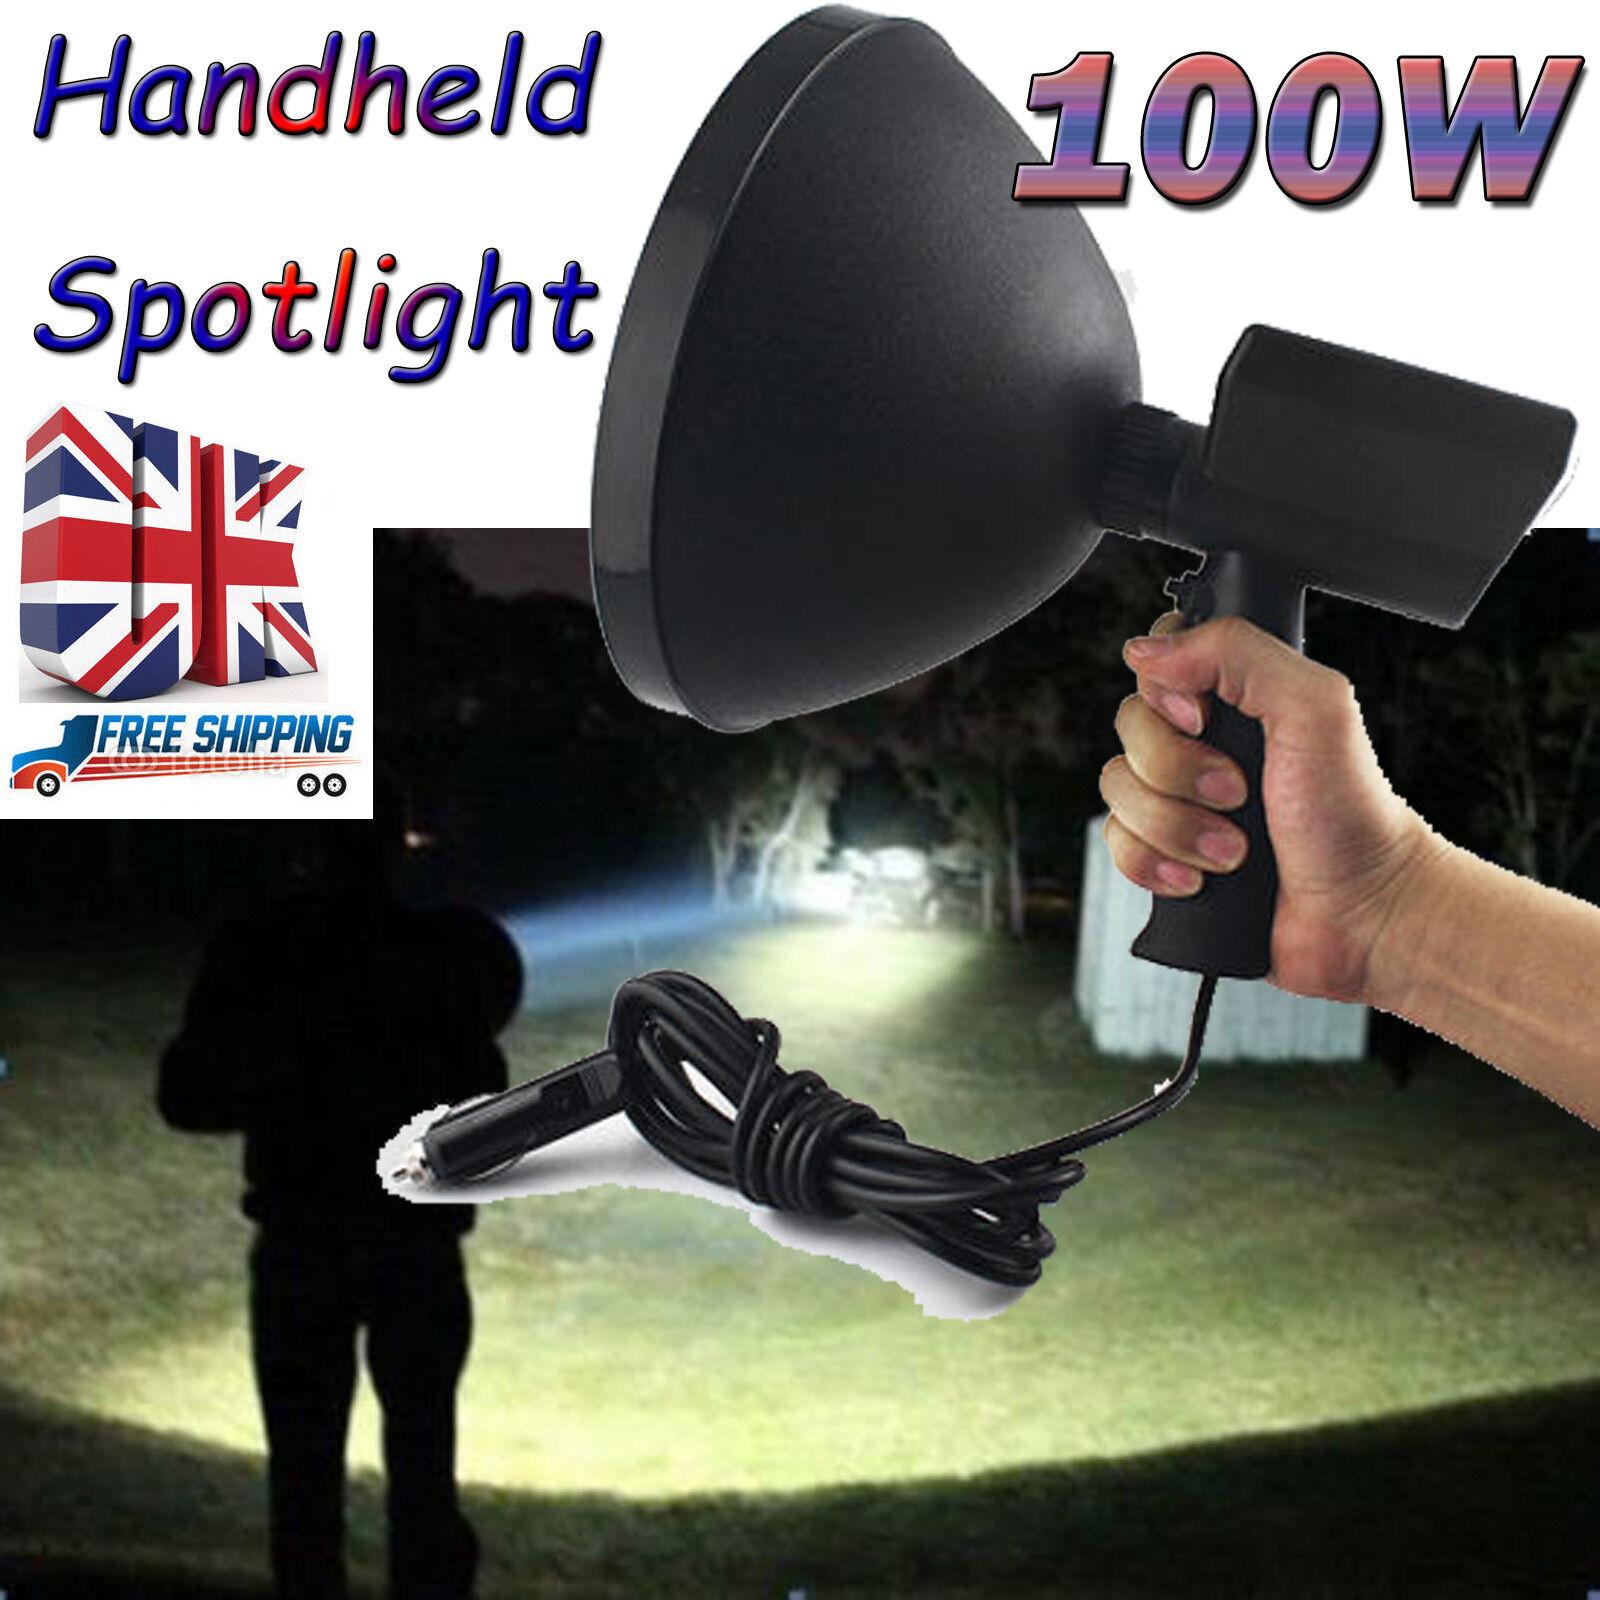 10000lm 12v Spotlight Handheld Hunting Car HID Spot Light Camping Fishing Lamp